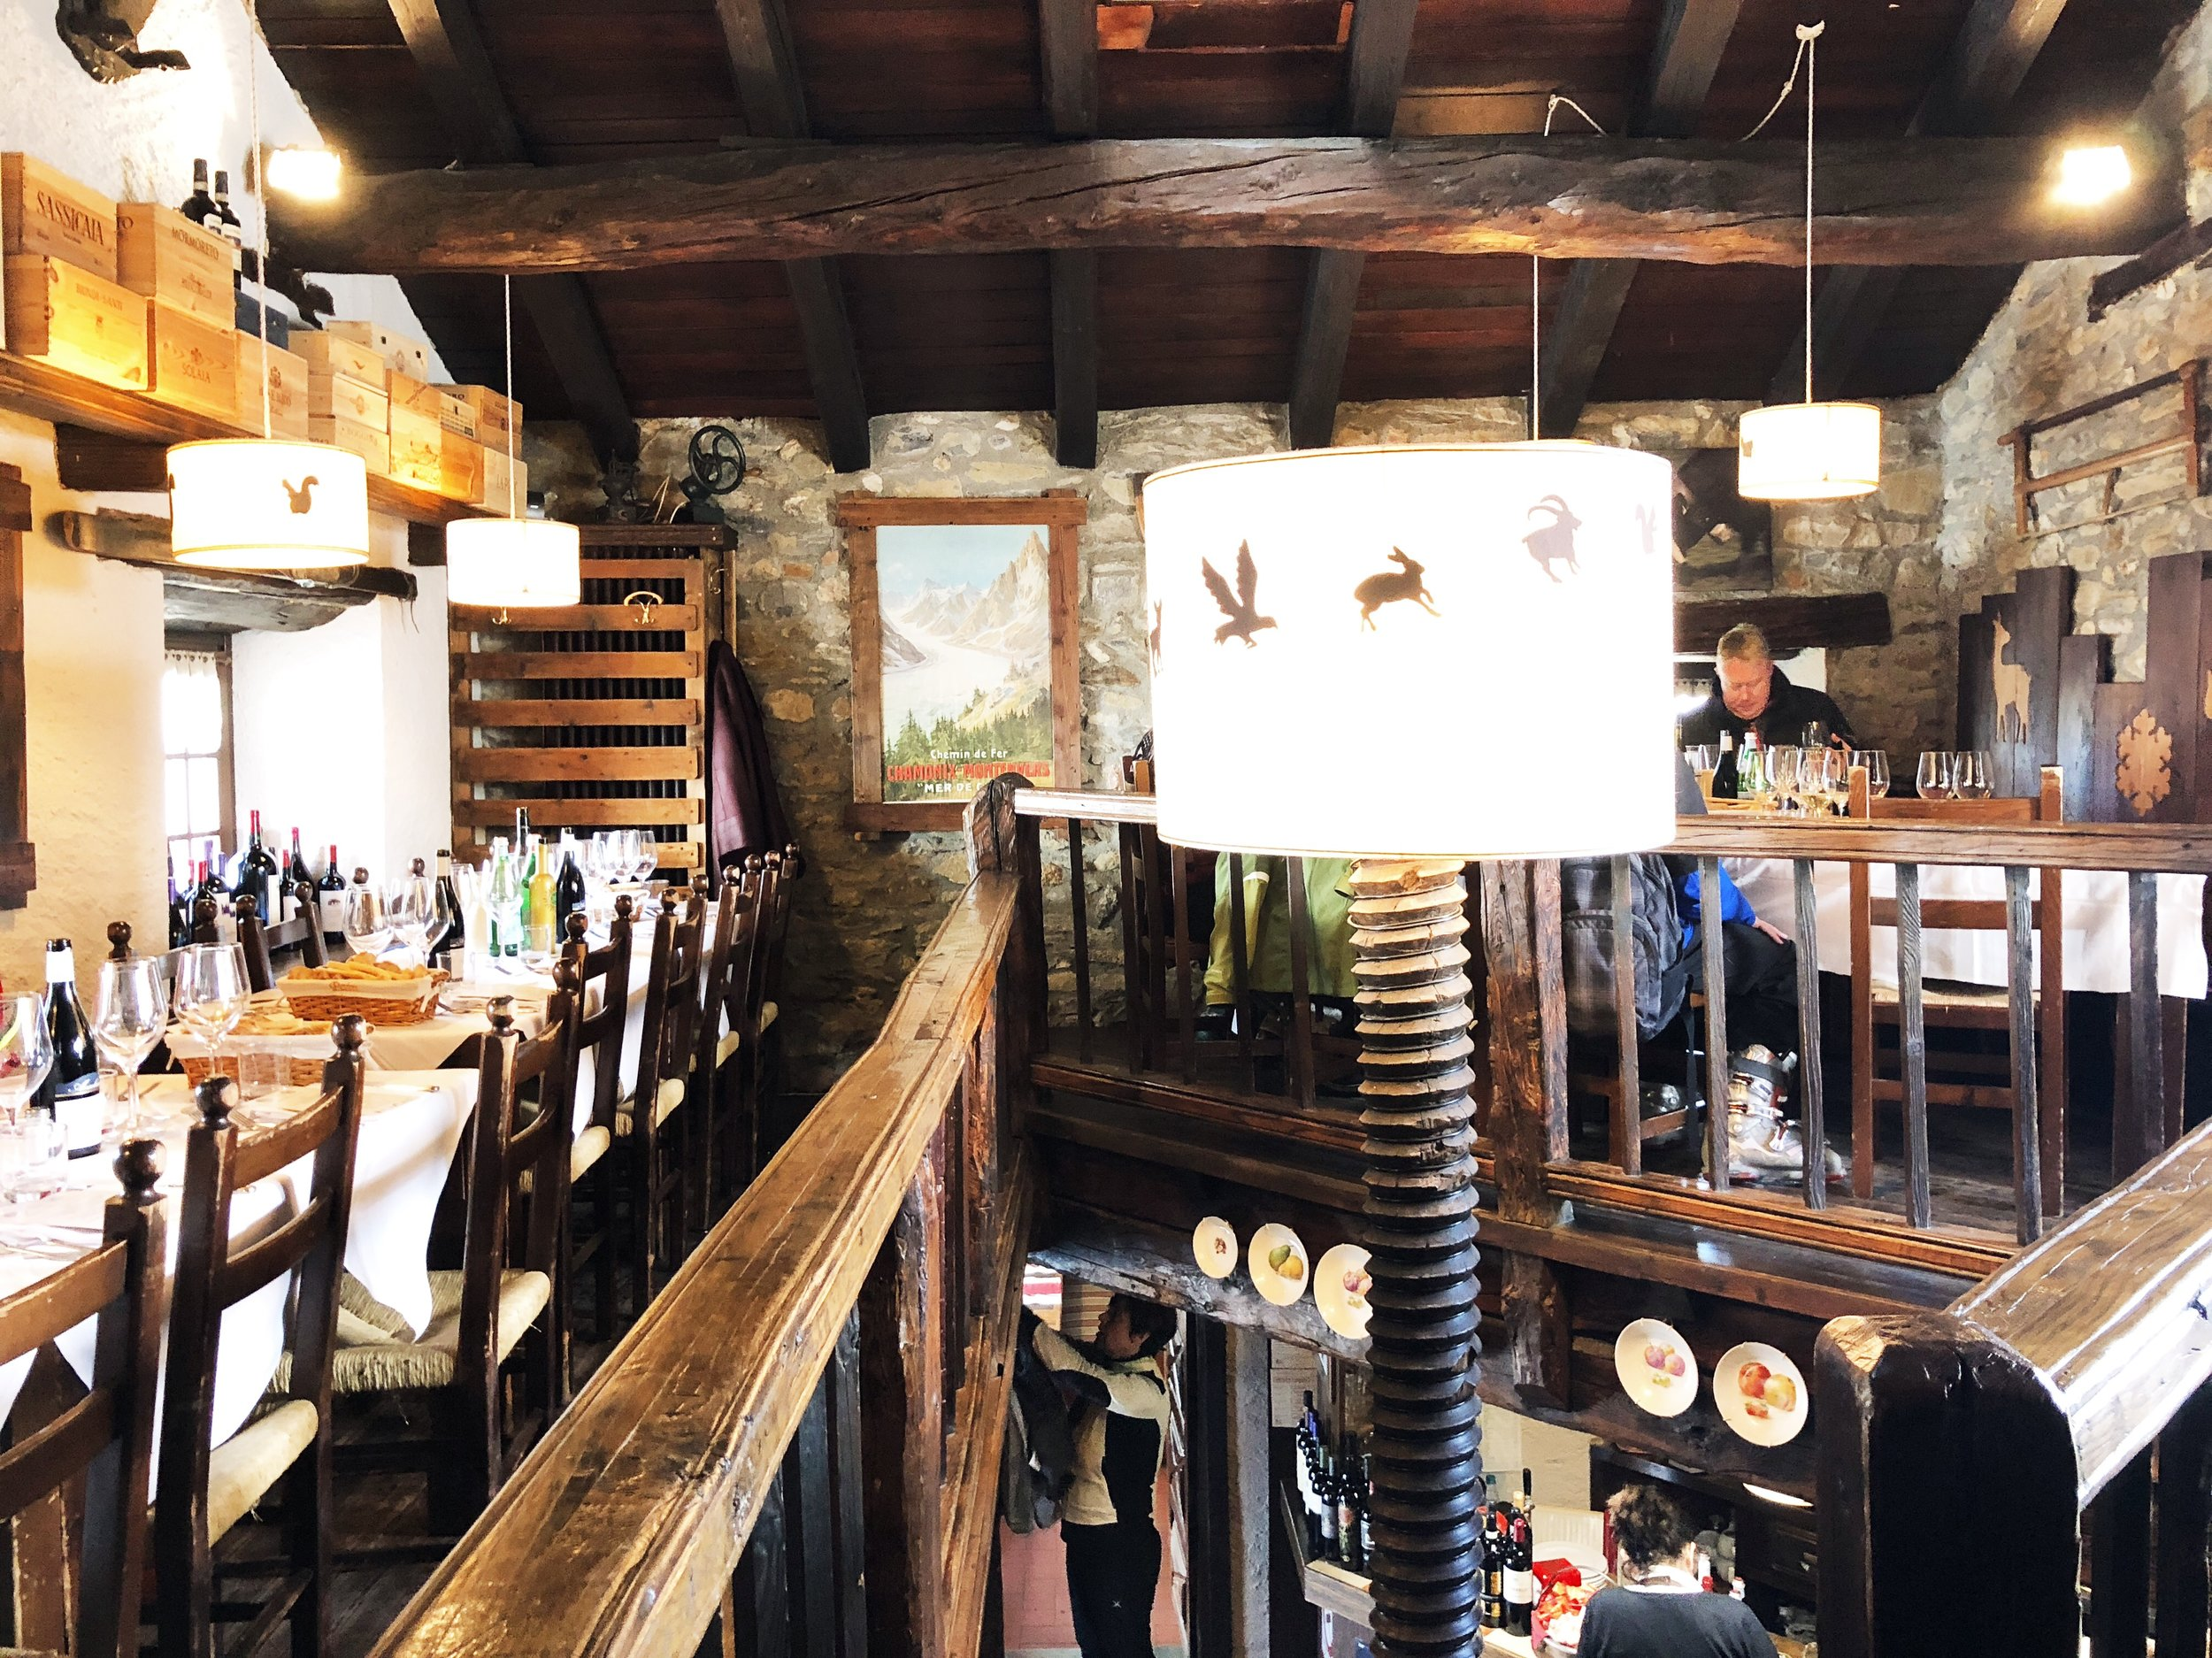 Inside Chateau Branlat